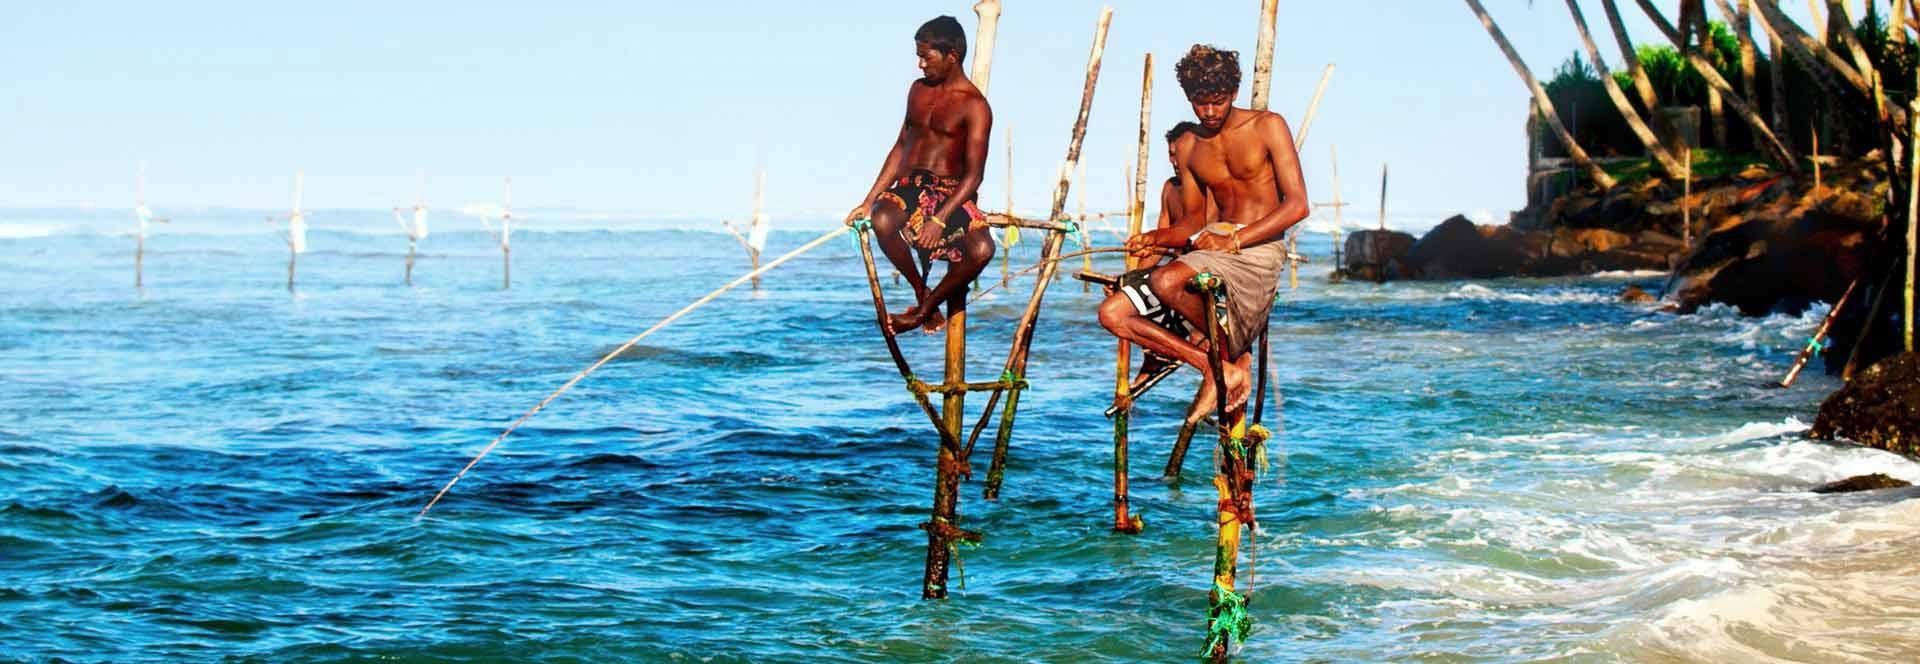 Sri Lanka Holidays. Tours & Holidays In Sri Lanka In 2021-2021 Holidays Mercantile Sl